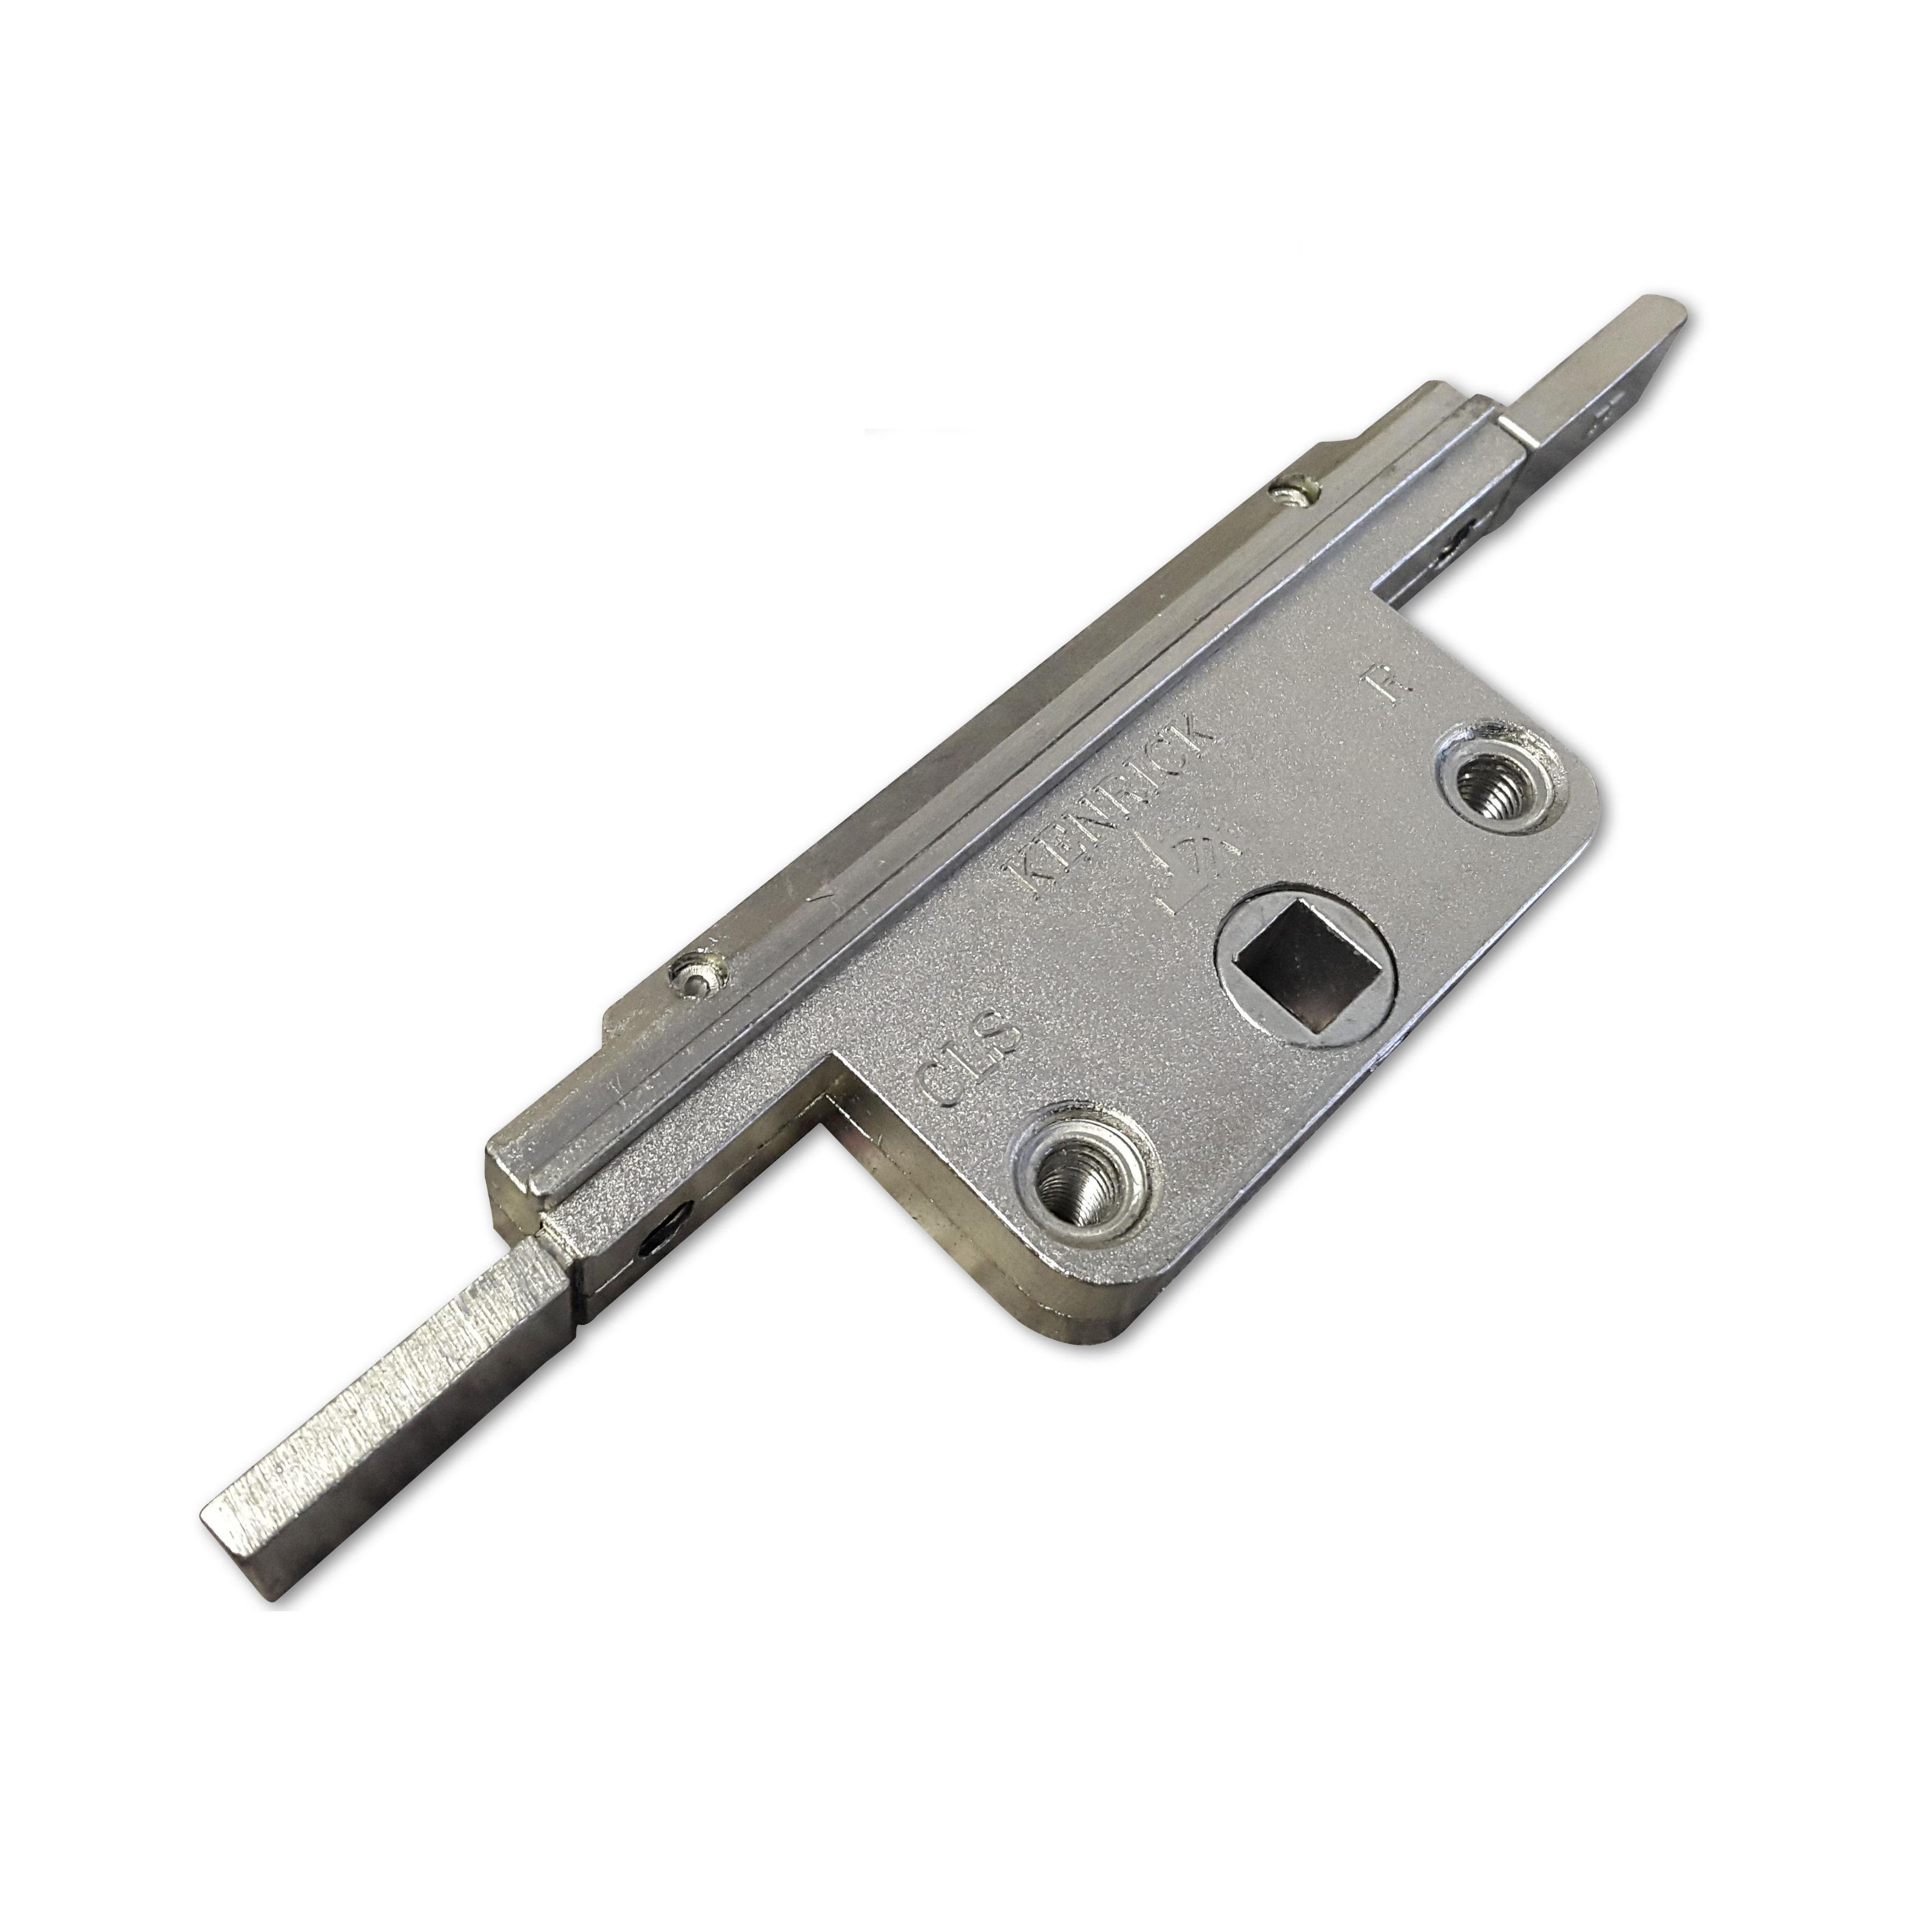 Kenrick Centurion Upvc Window Lock Espag Rod Gearbox